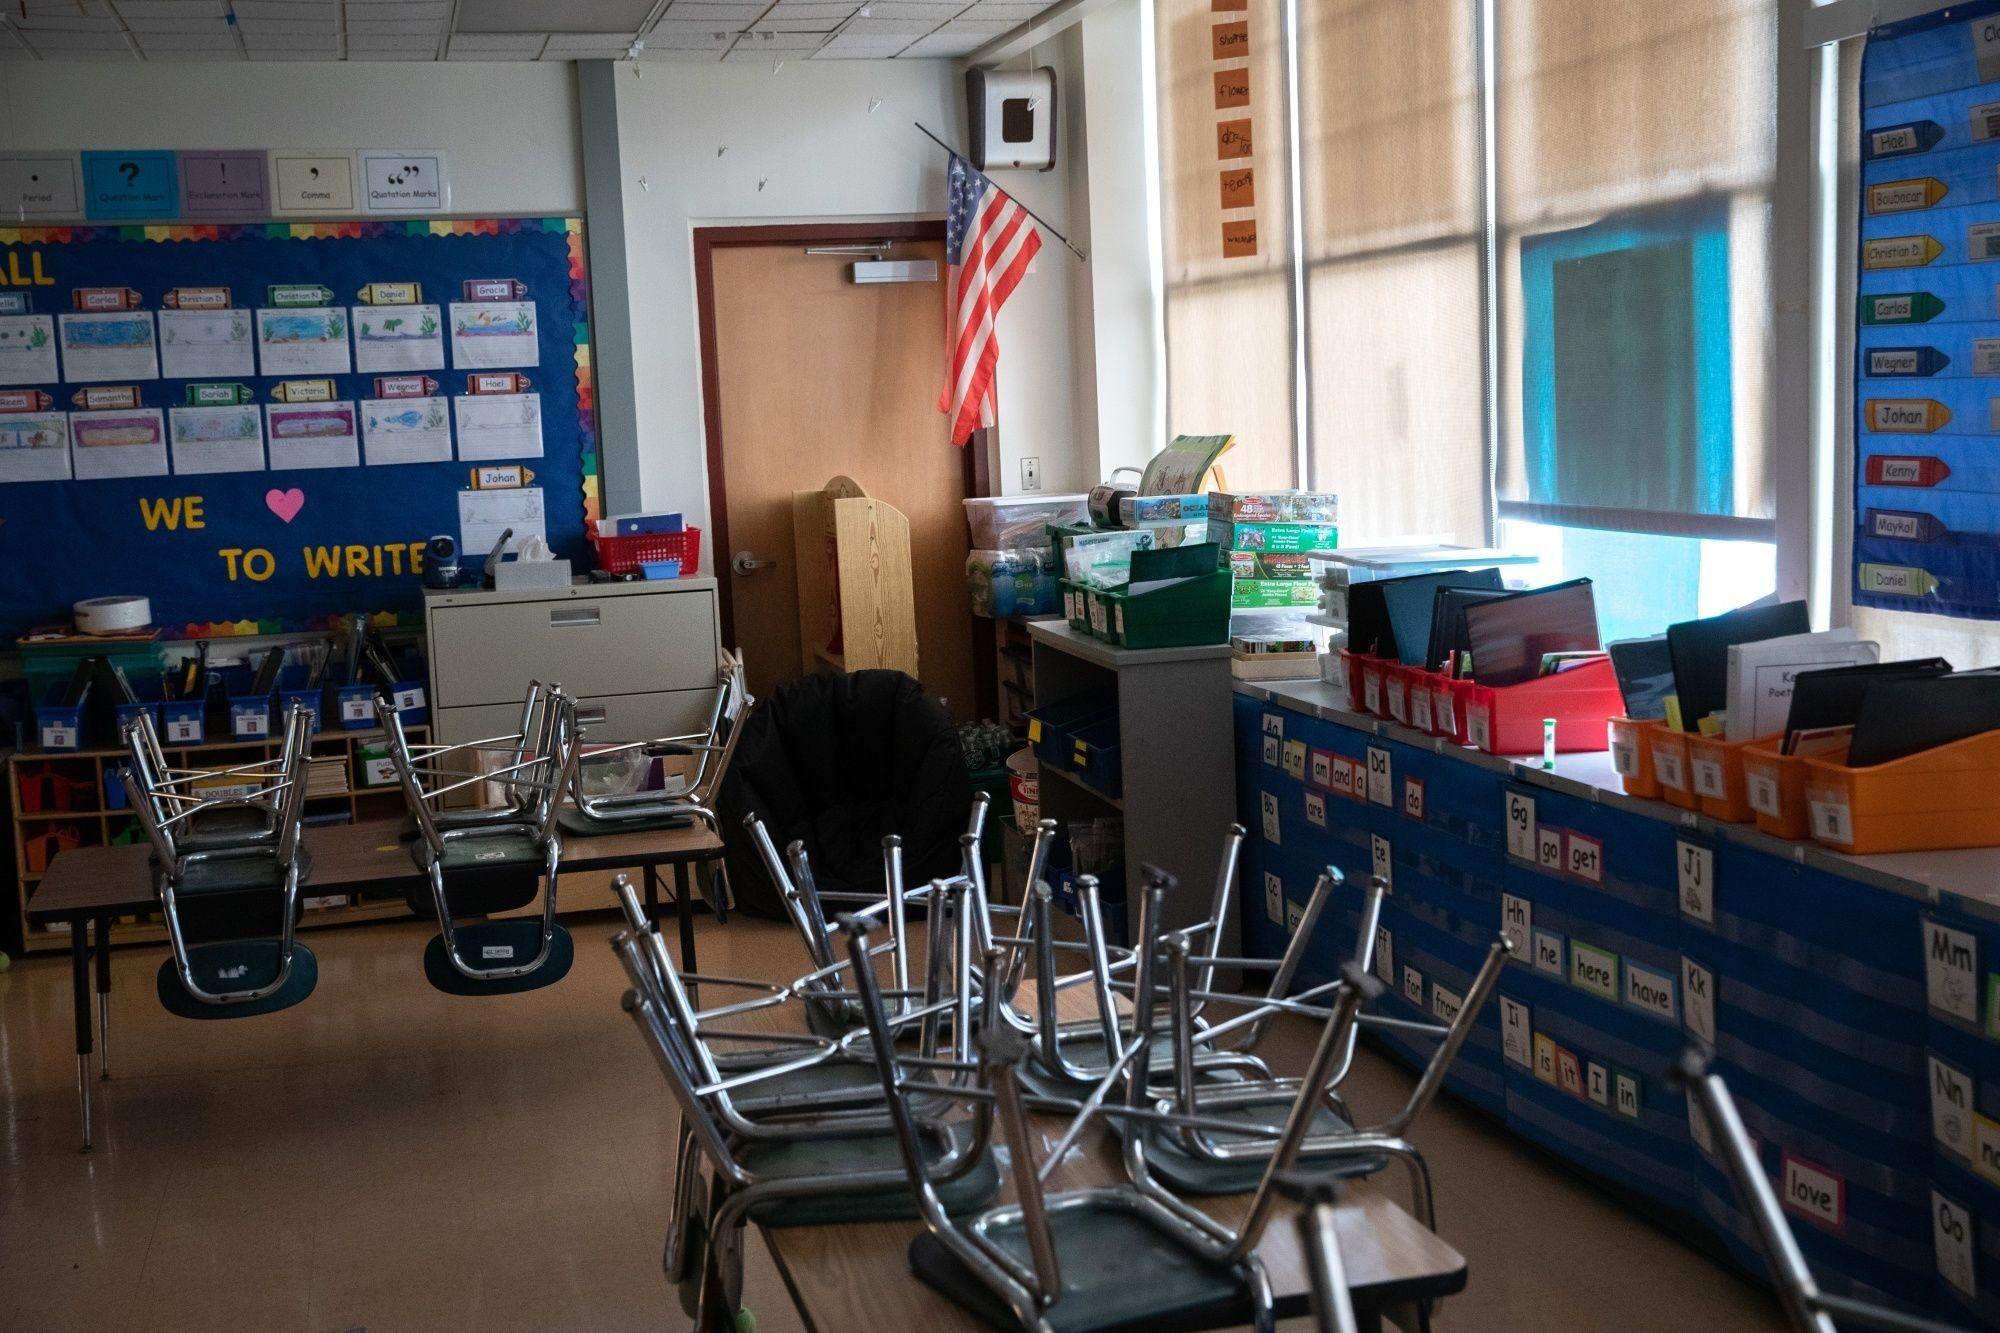 Schools Across The U..S. Close To Help Stop Spread Of Coronavirus